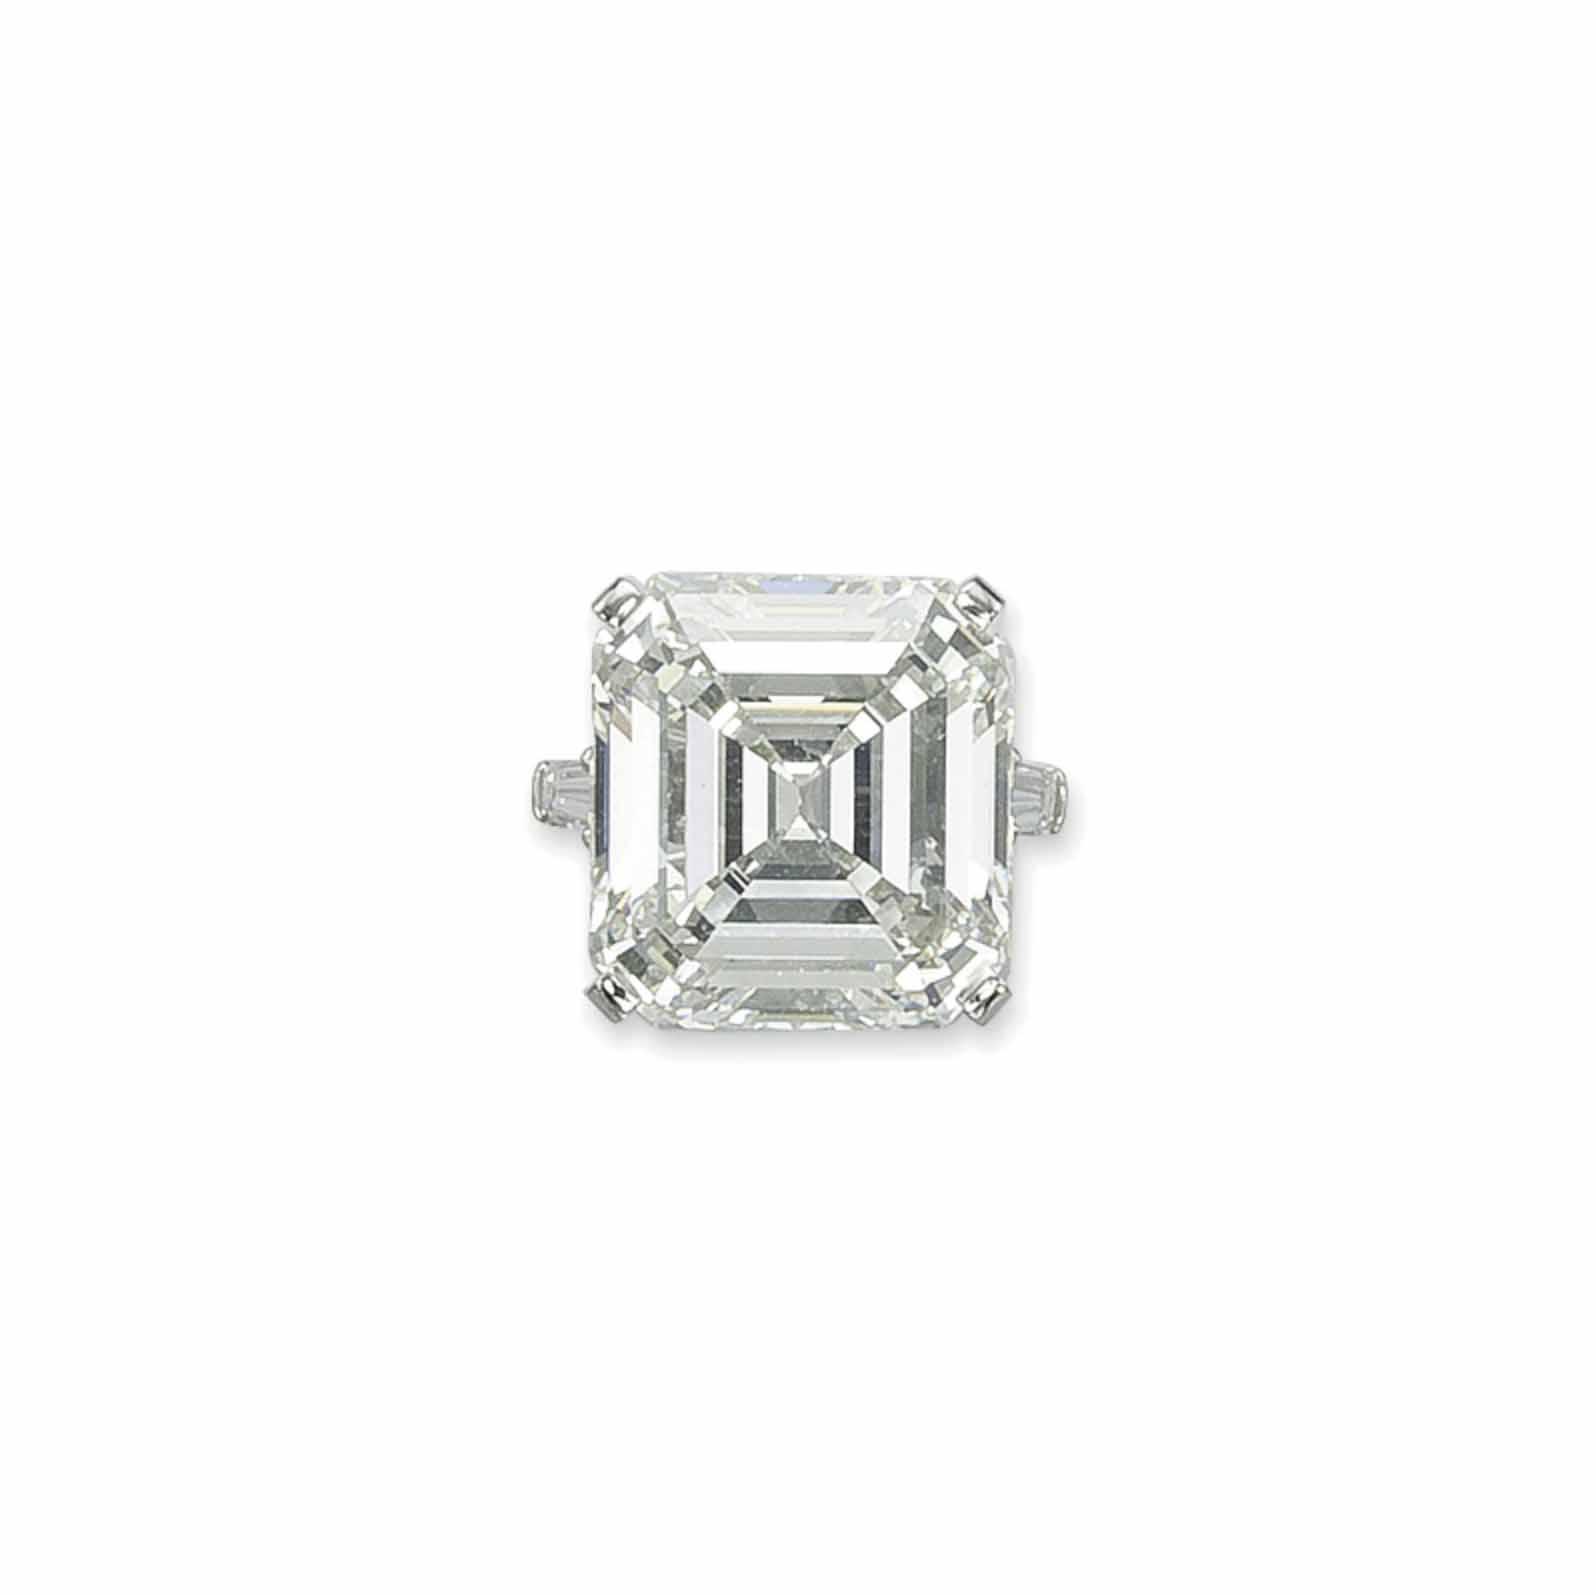 AN IMPRESSIVE DIAMOND RING, BY SABBADINI